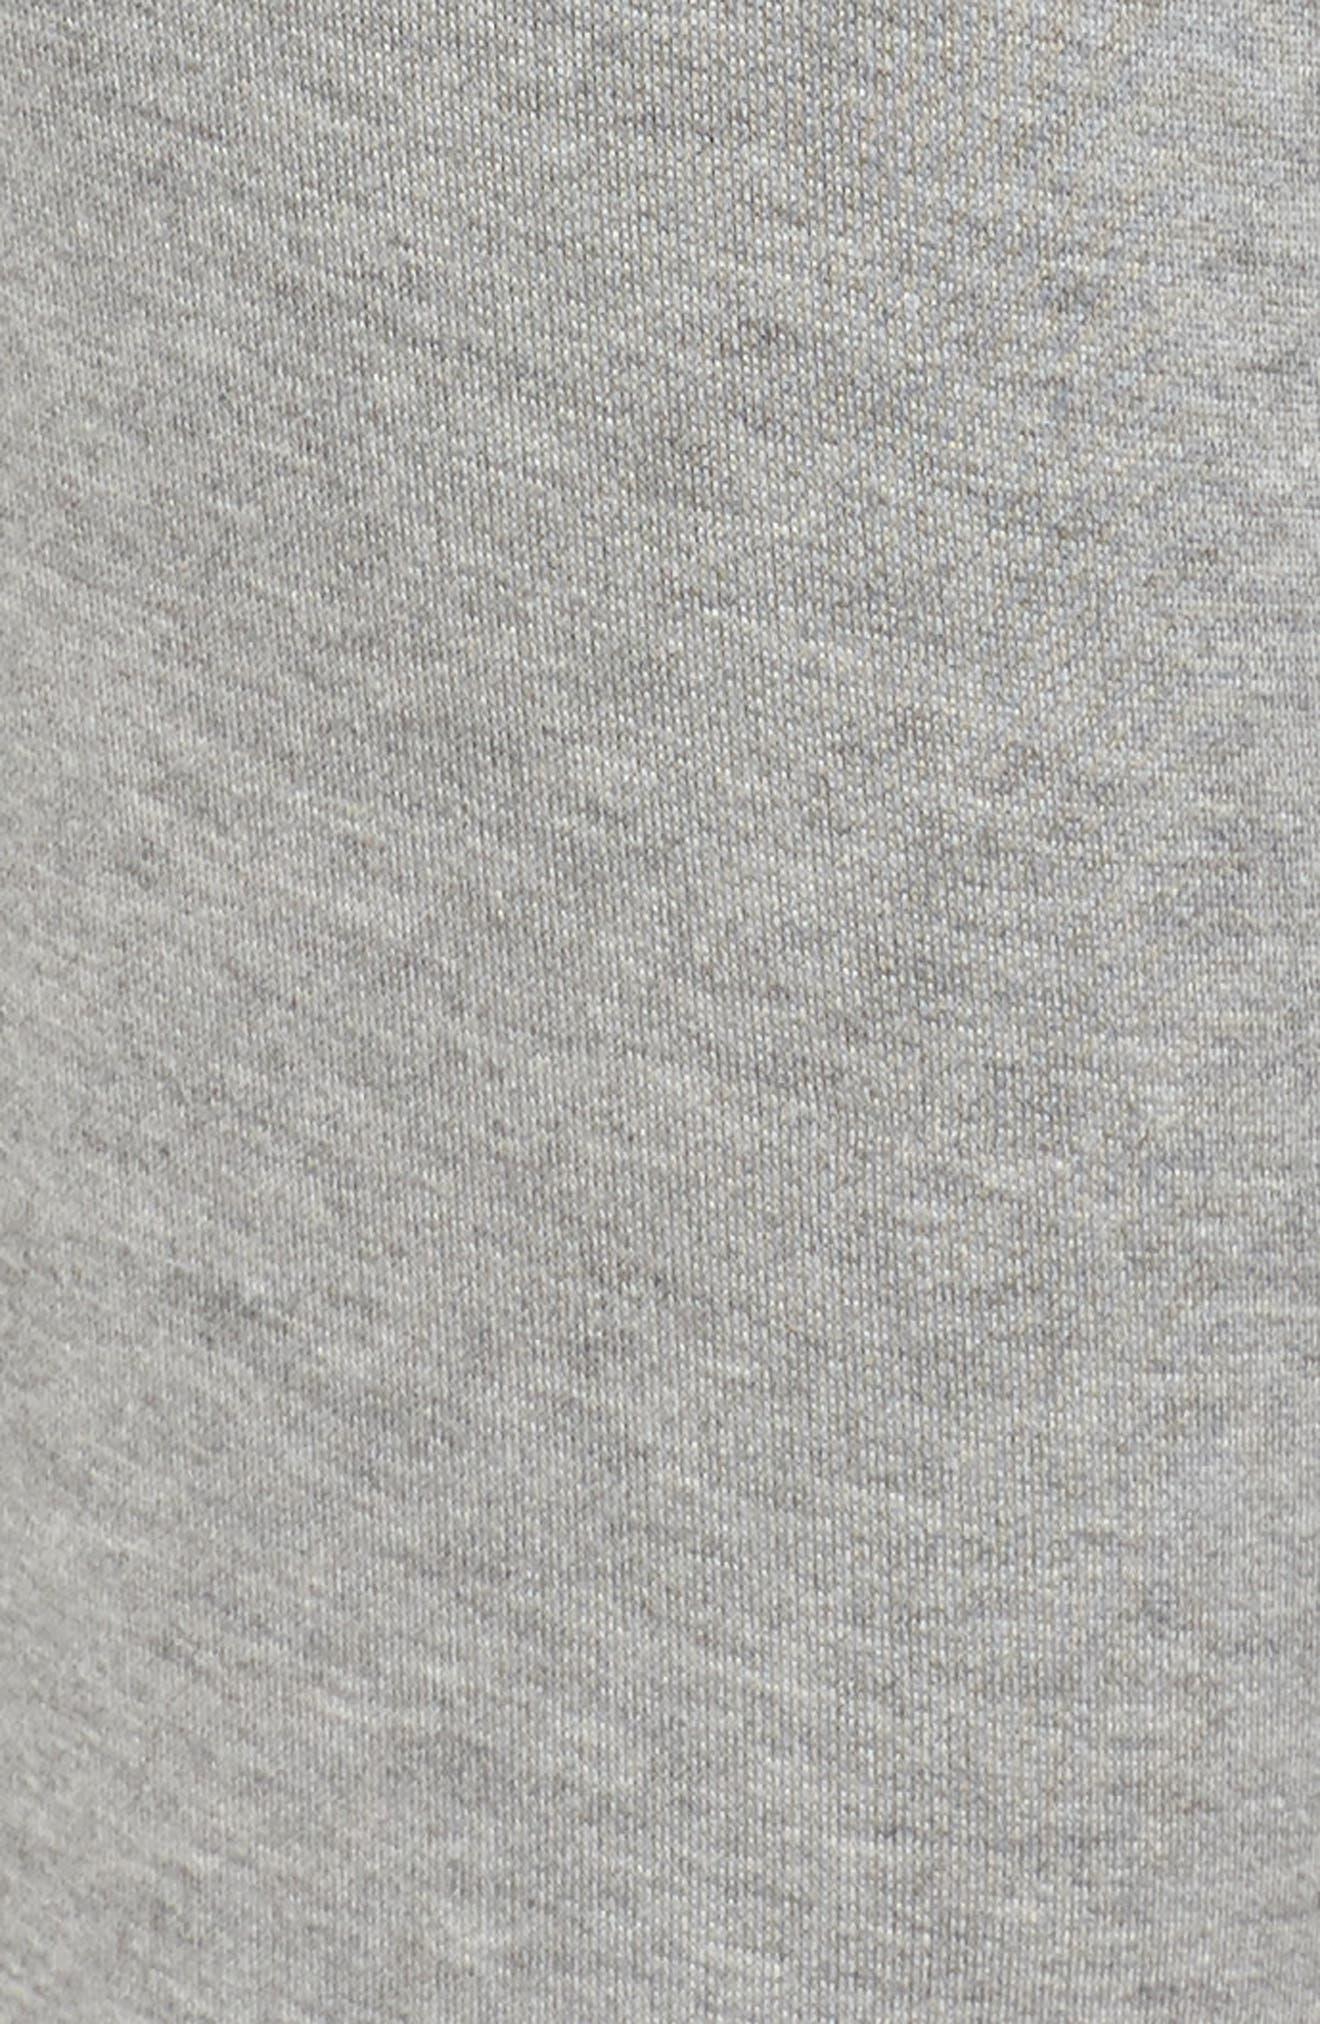 Heron Ankle Jogger Pants,                             Alternate thumbnail 6, color,                             051